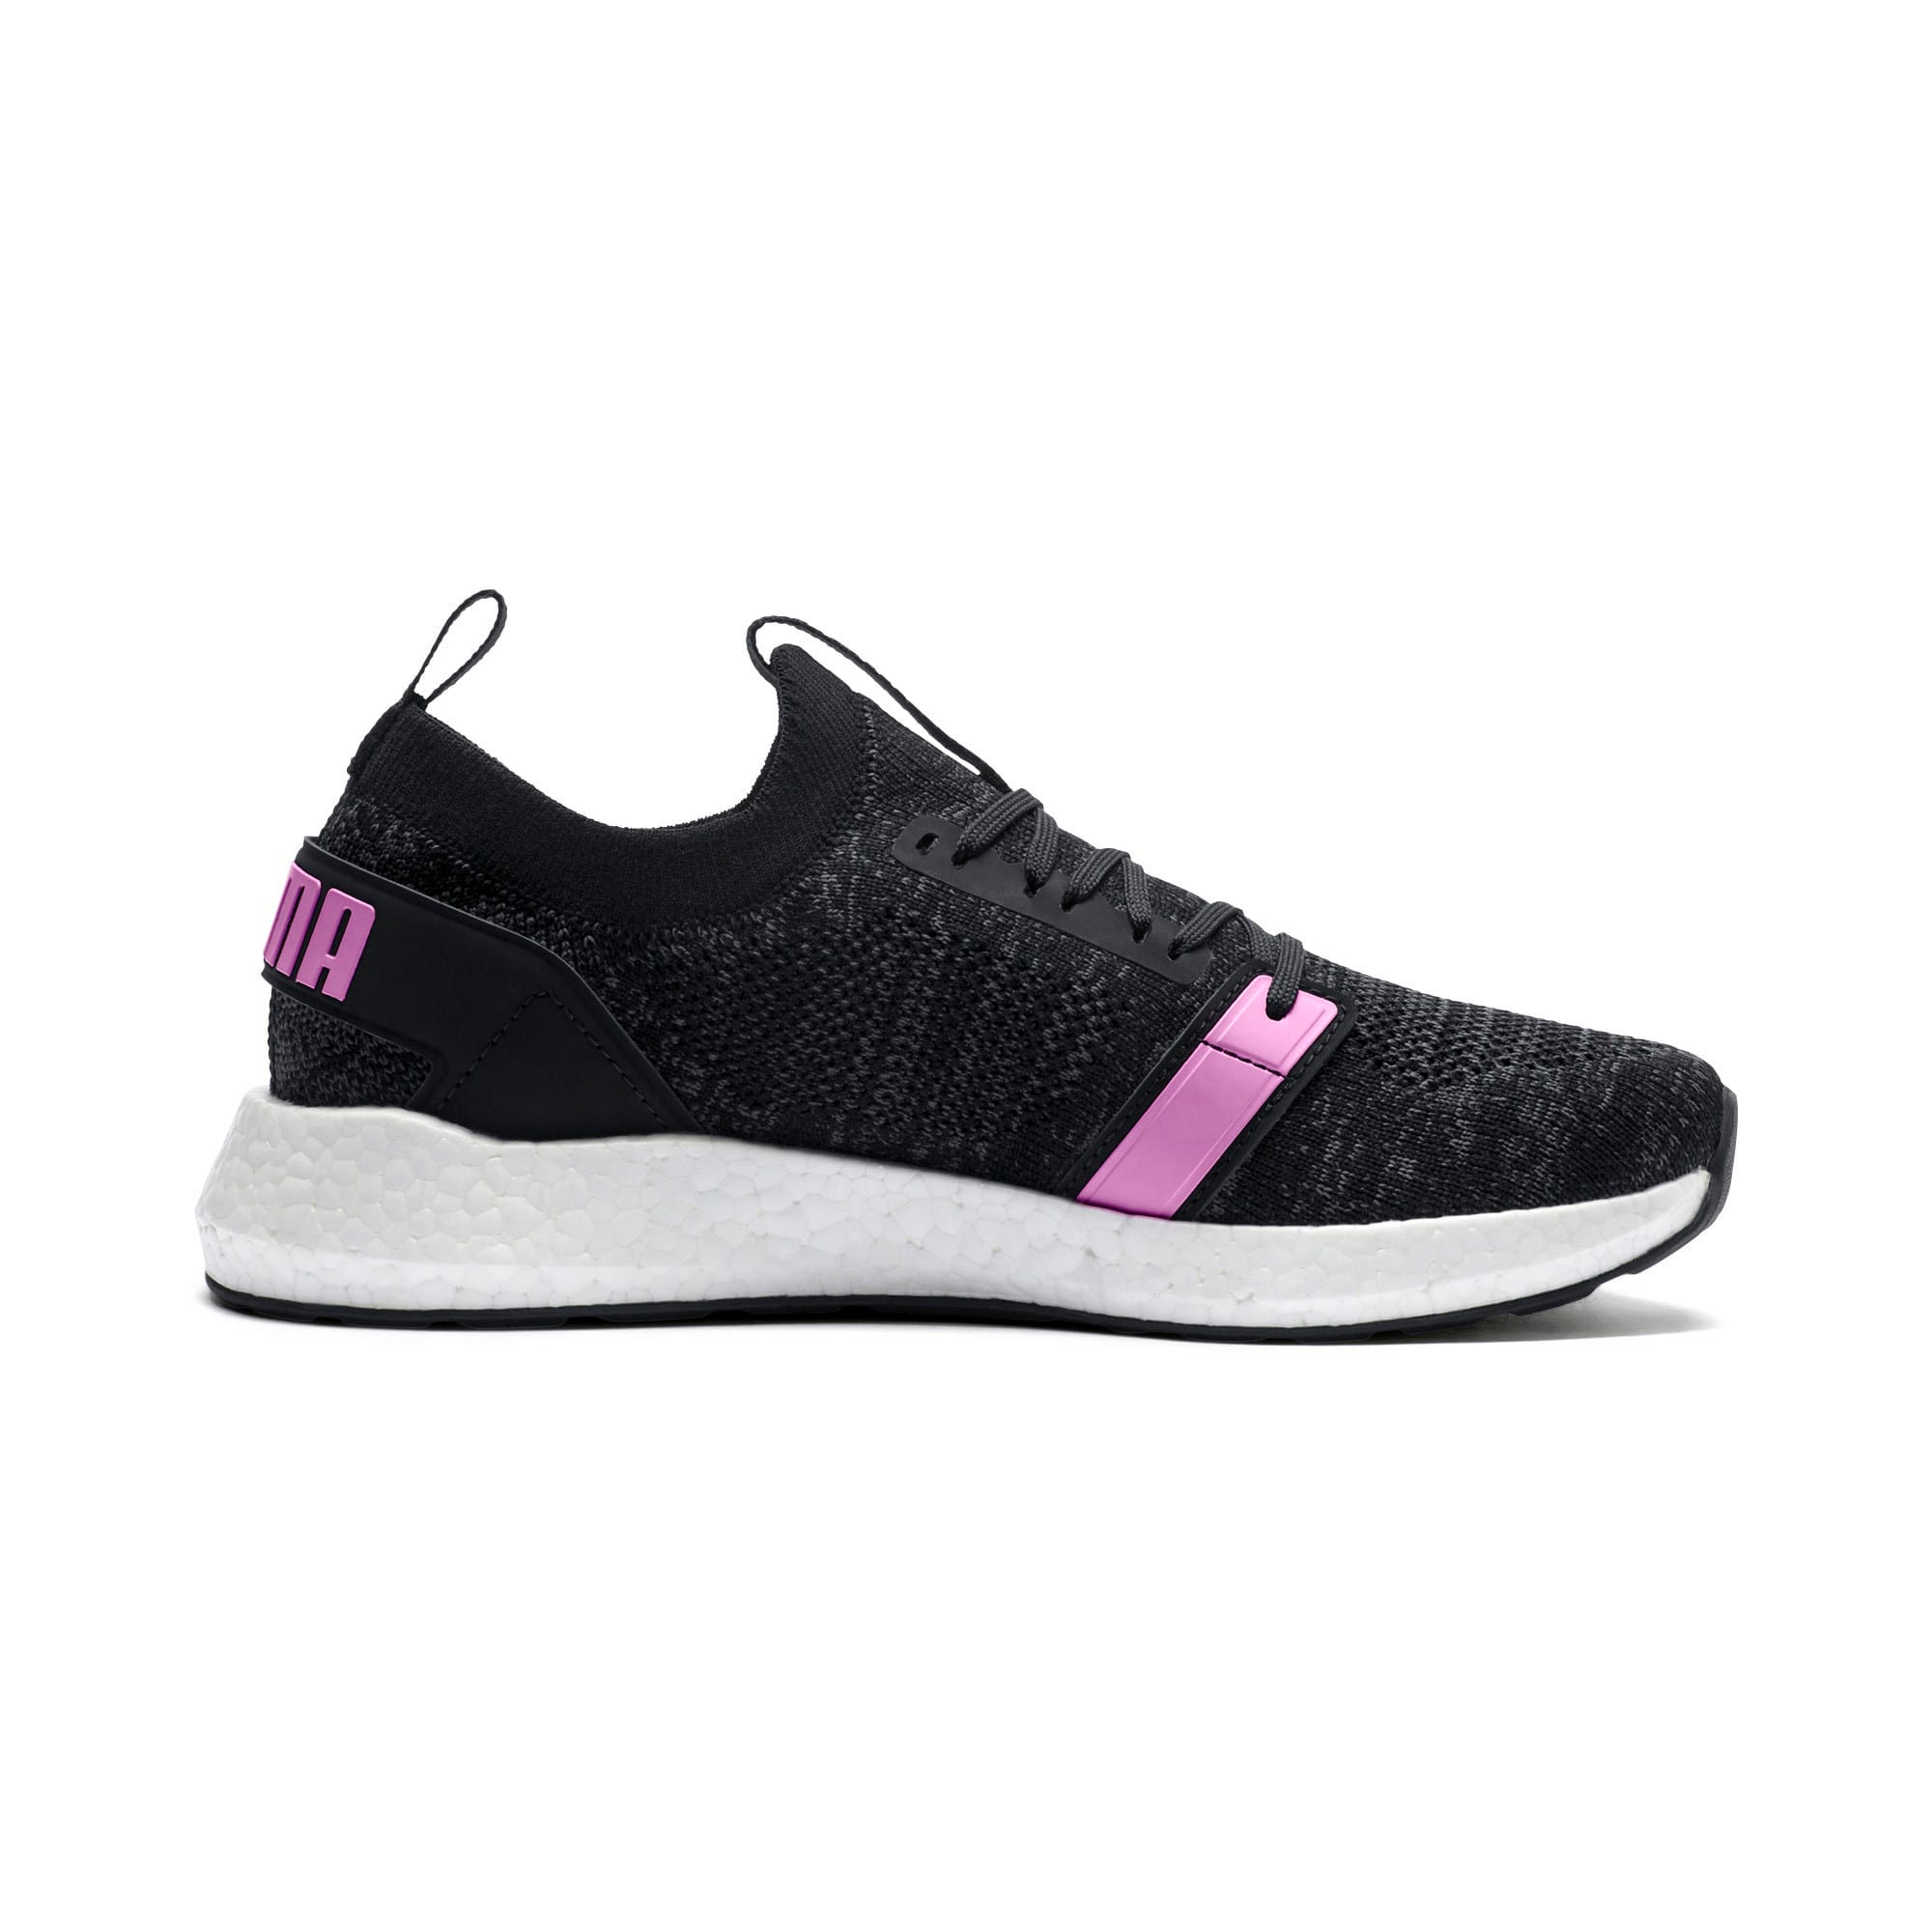 Thumbnail 5 of NRGY Neko Engineer Knit Women's Running Shoes, Puma Black-Iron Gate-Orchid, medium